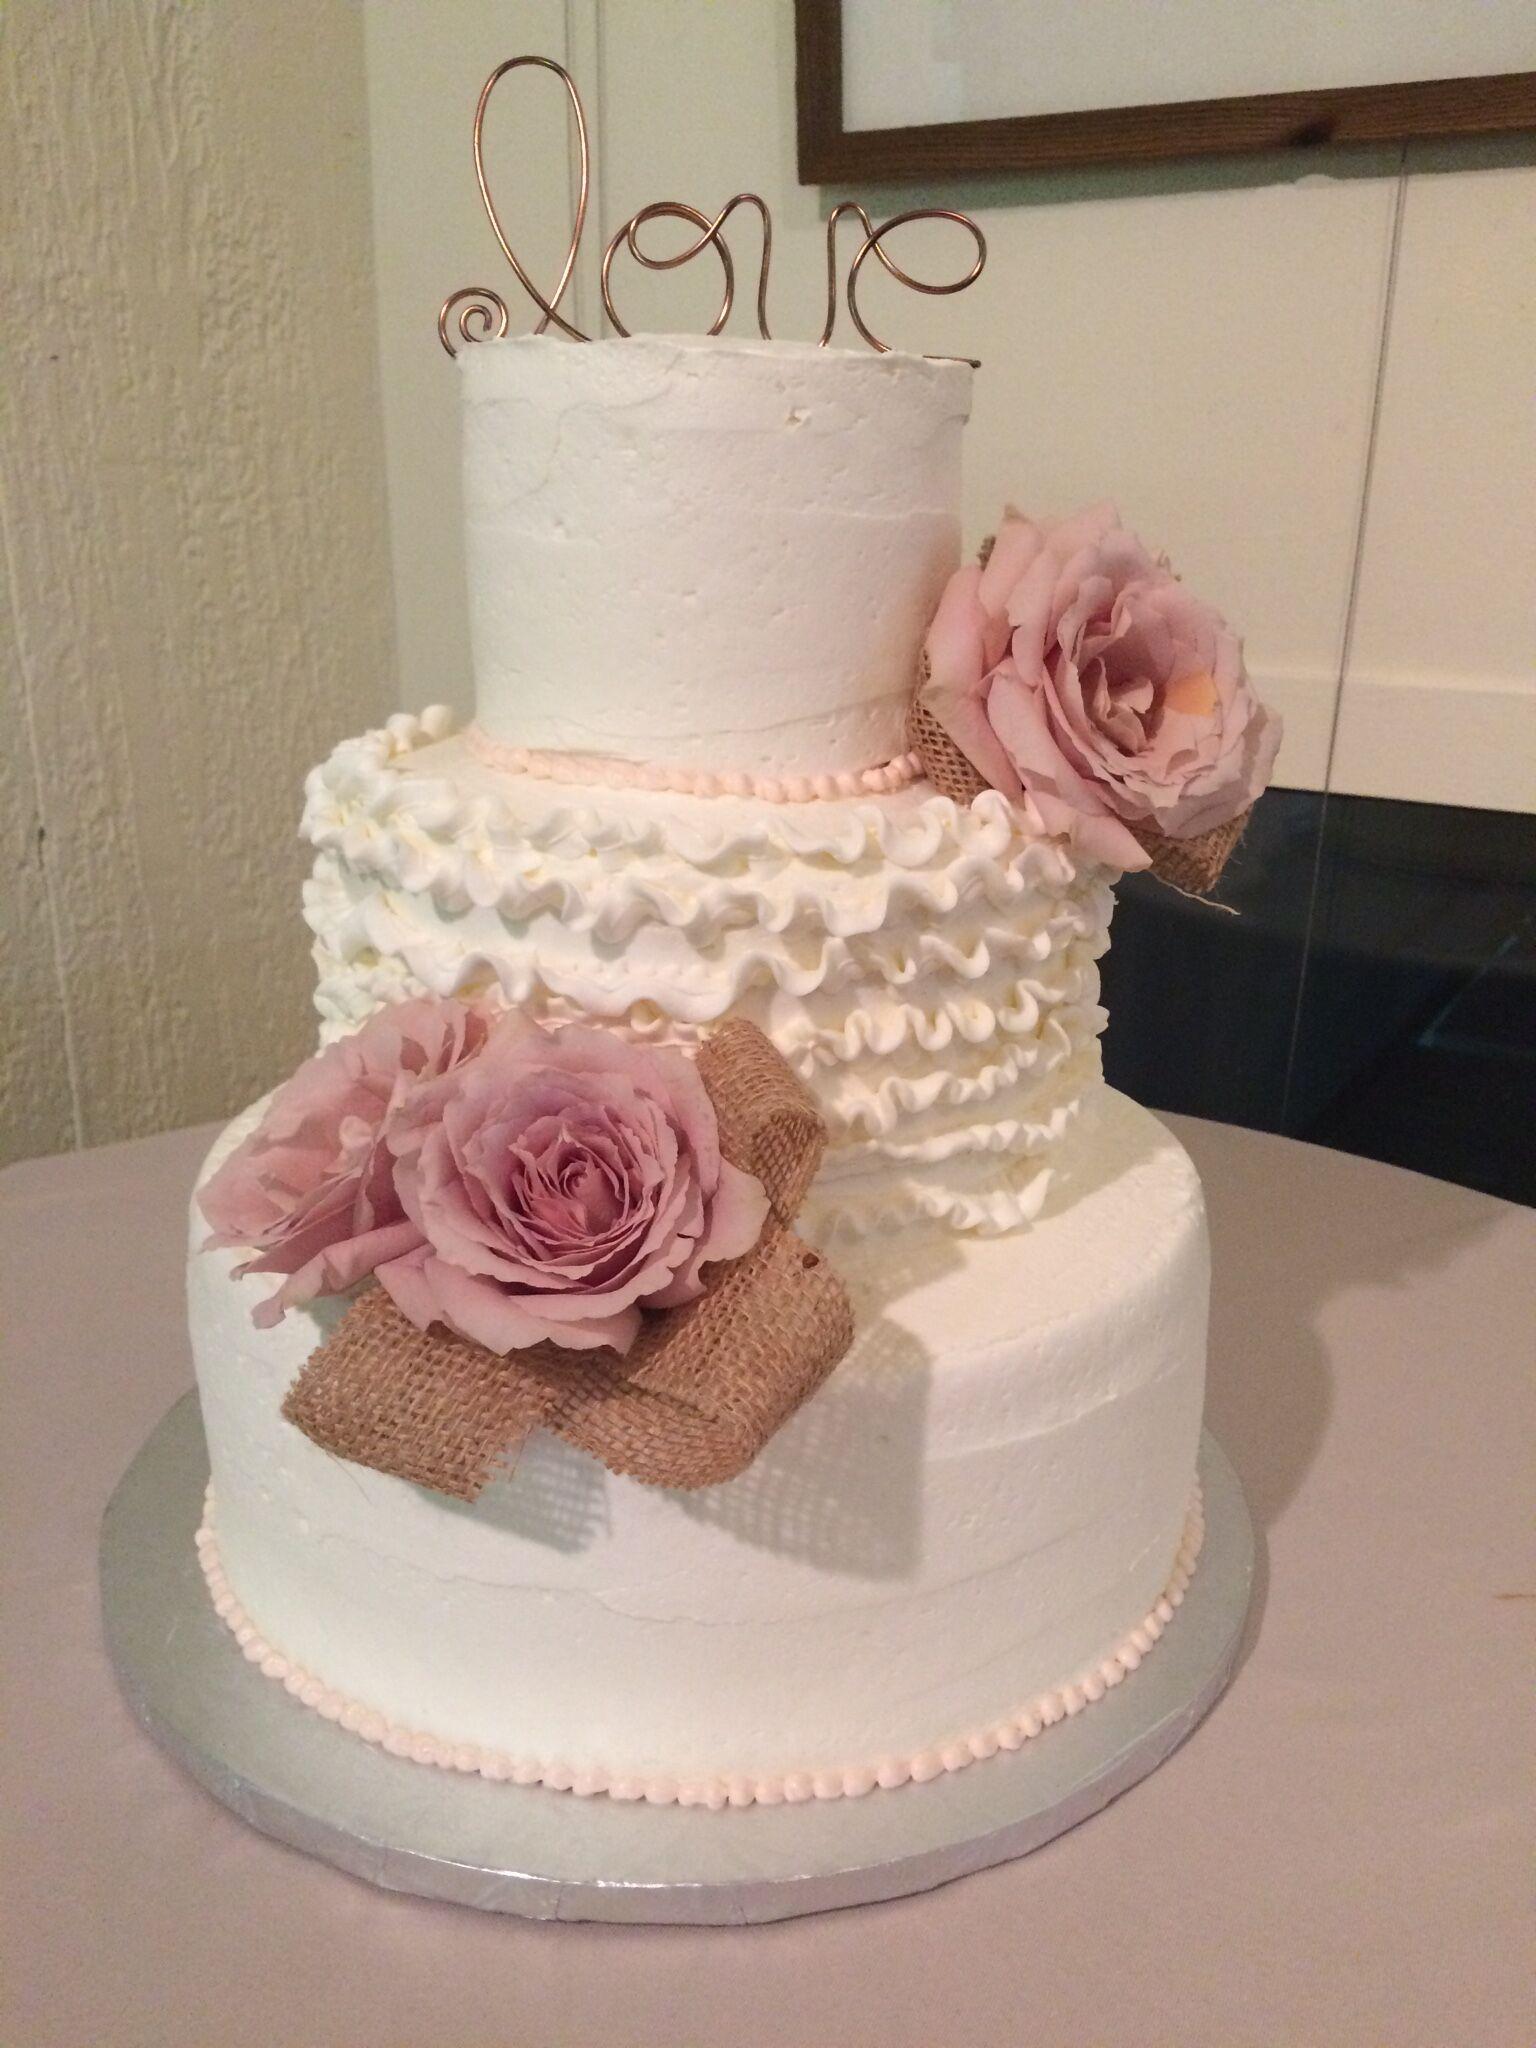 Weddings Bakery Delaware Beaches Ocean City Md